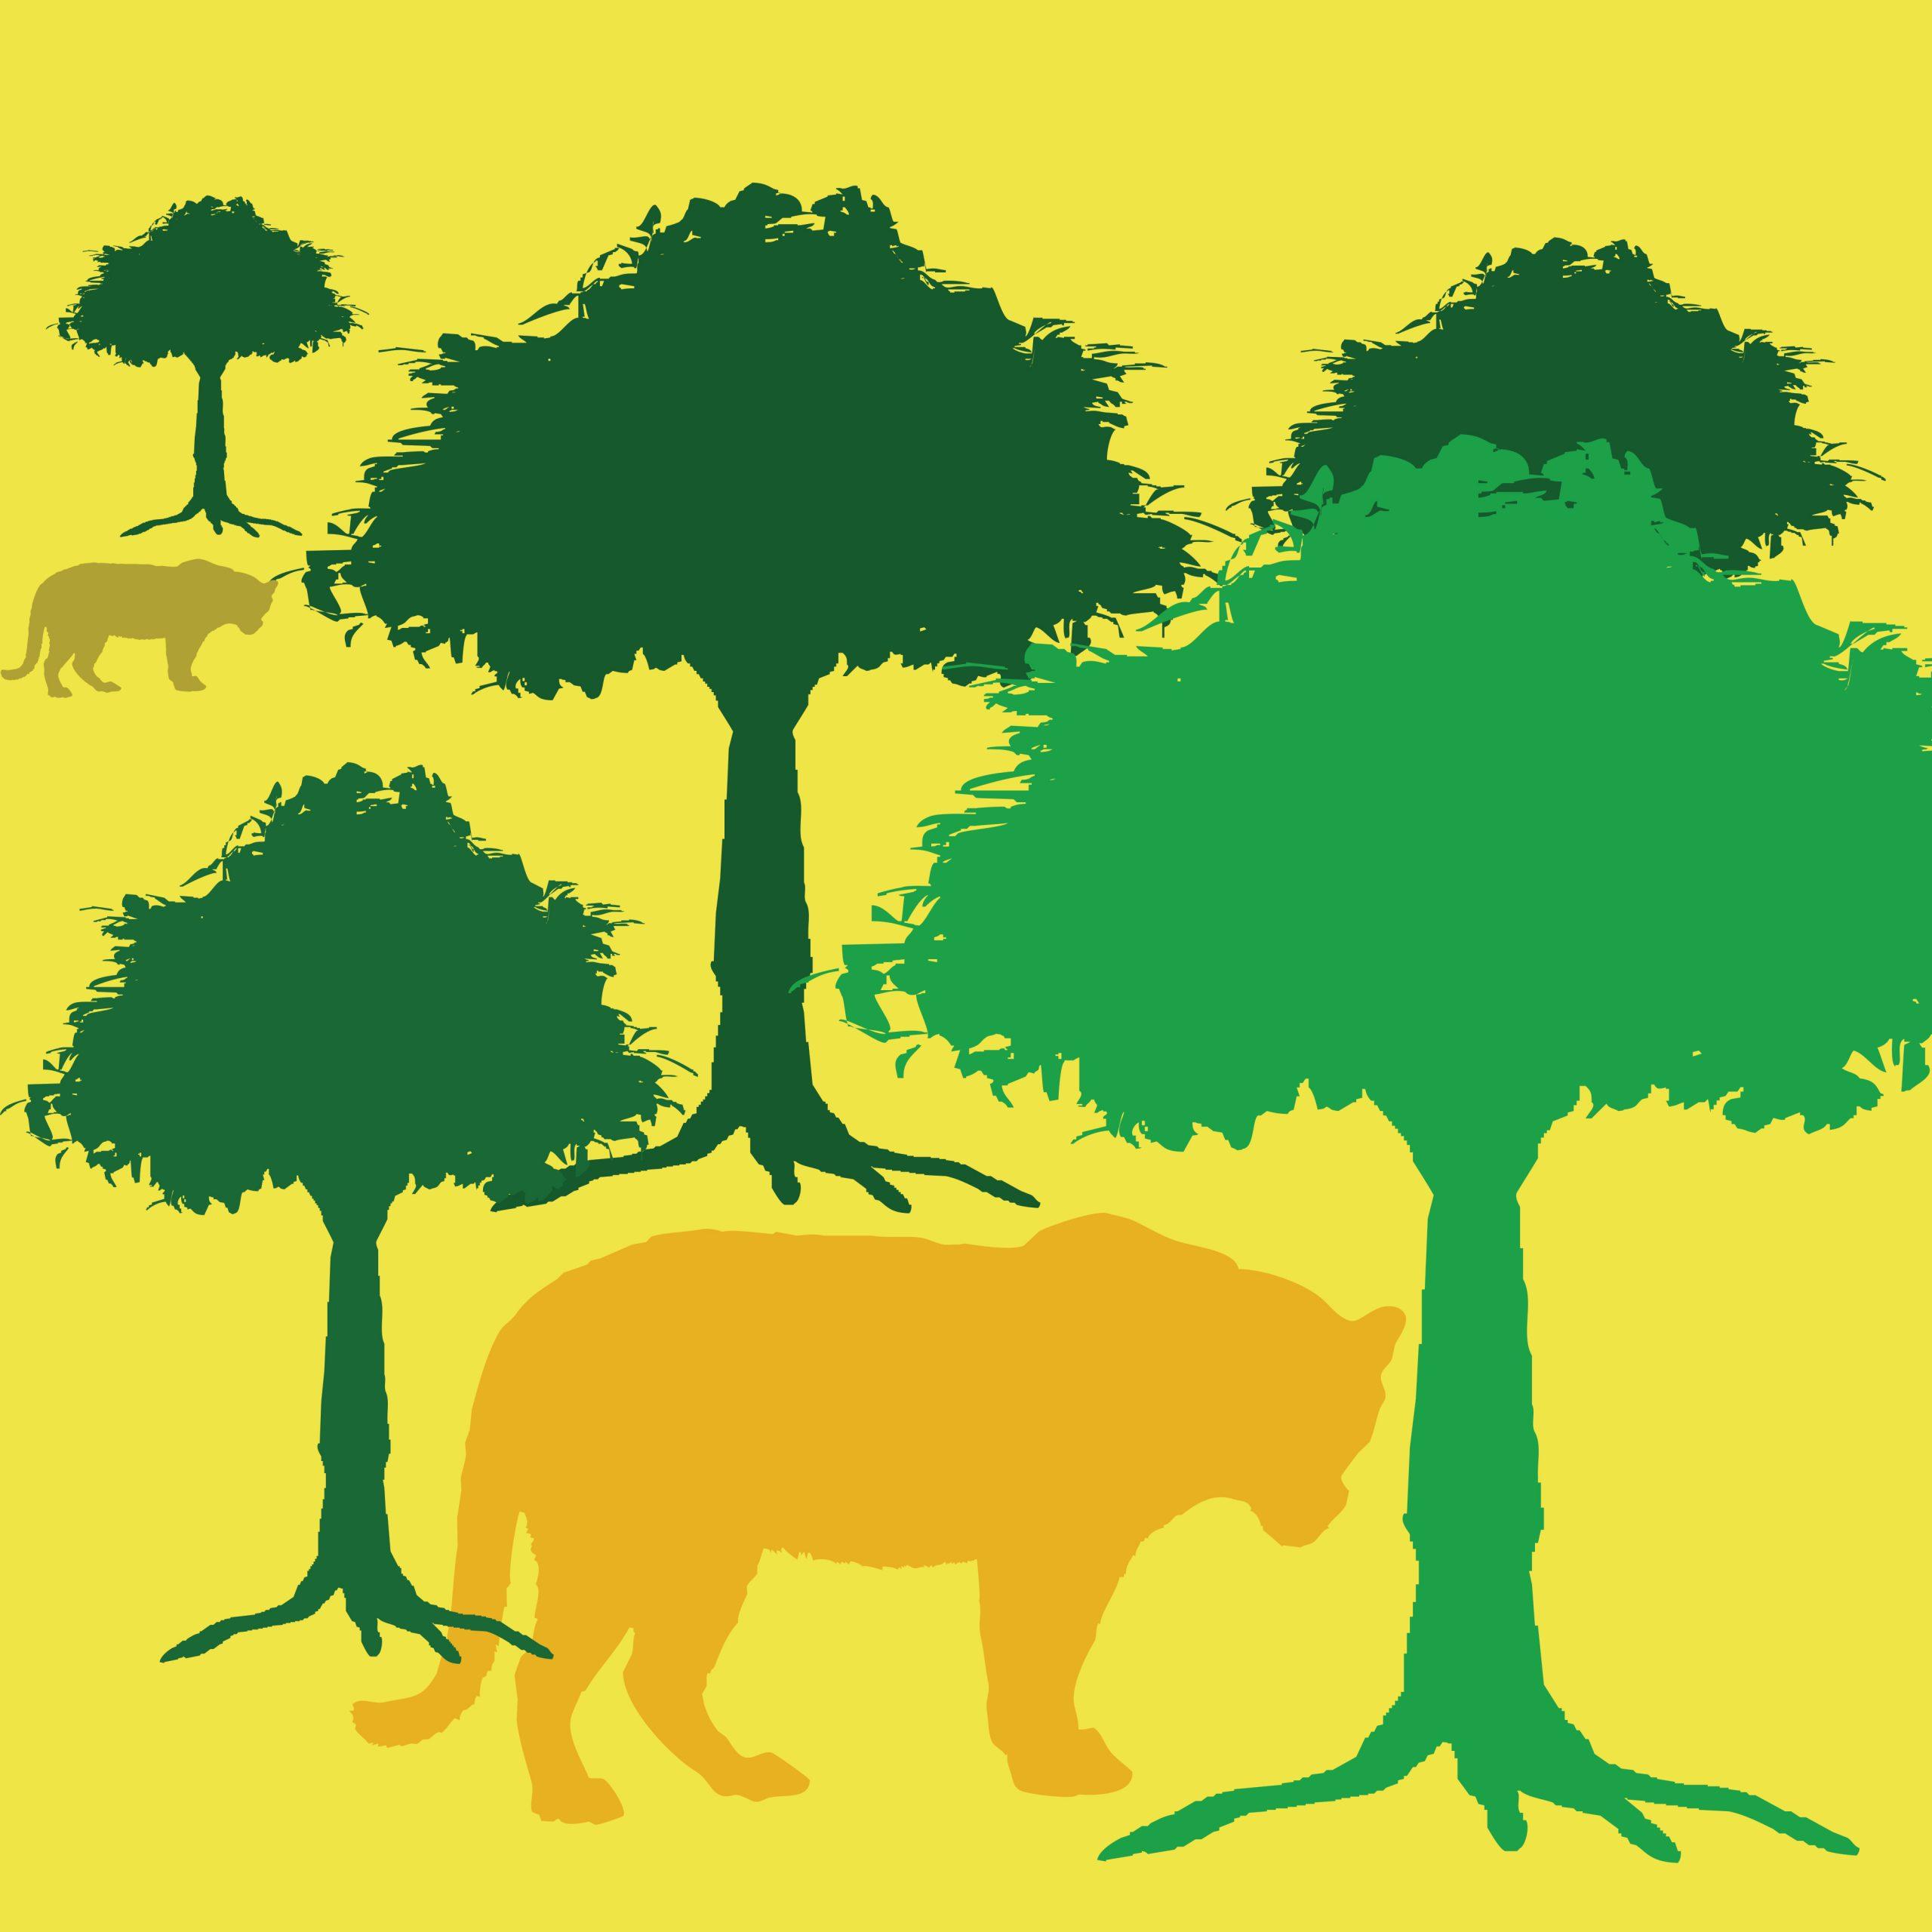 Tiger and tree illustration